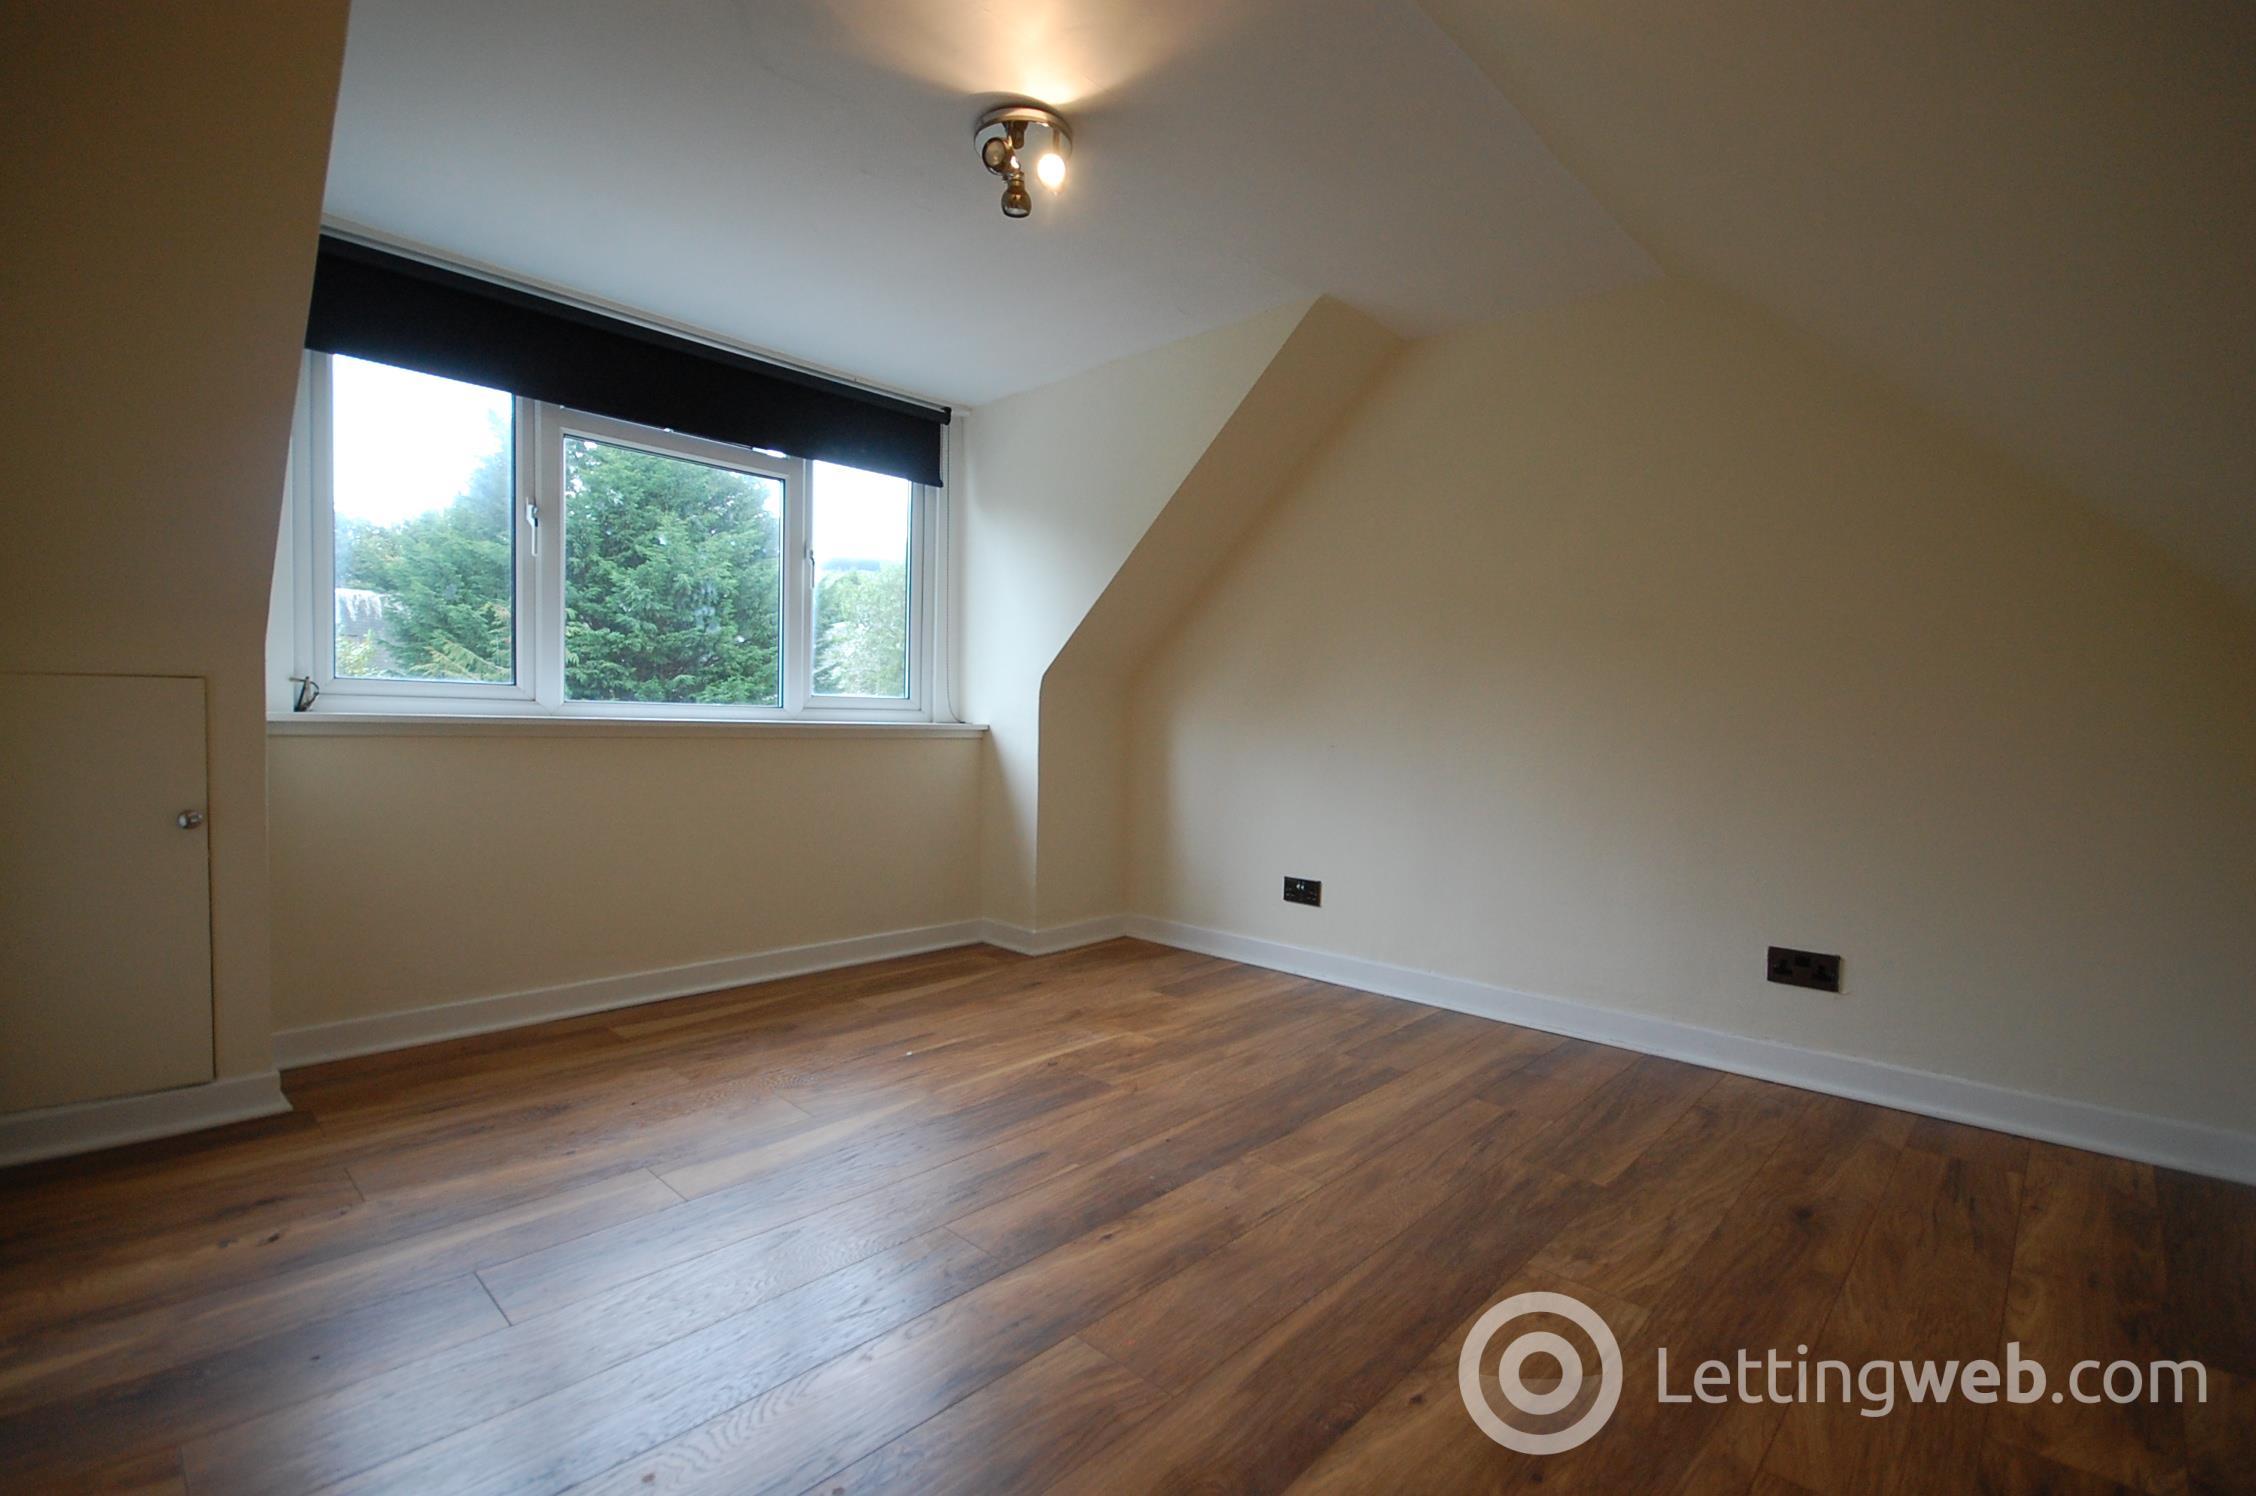 Property to rent in 86 Gala Park, Galashiels, TD1 1EZ